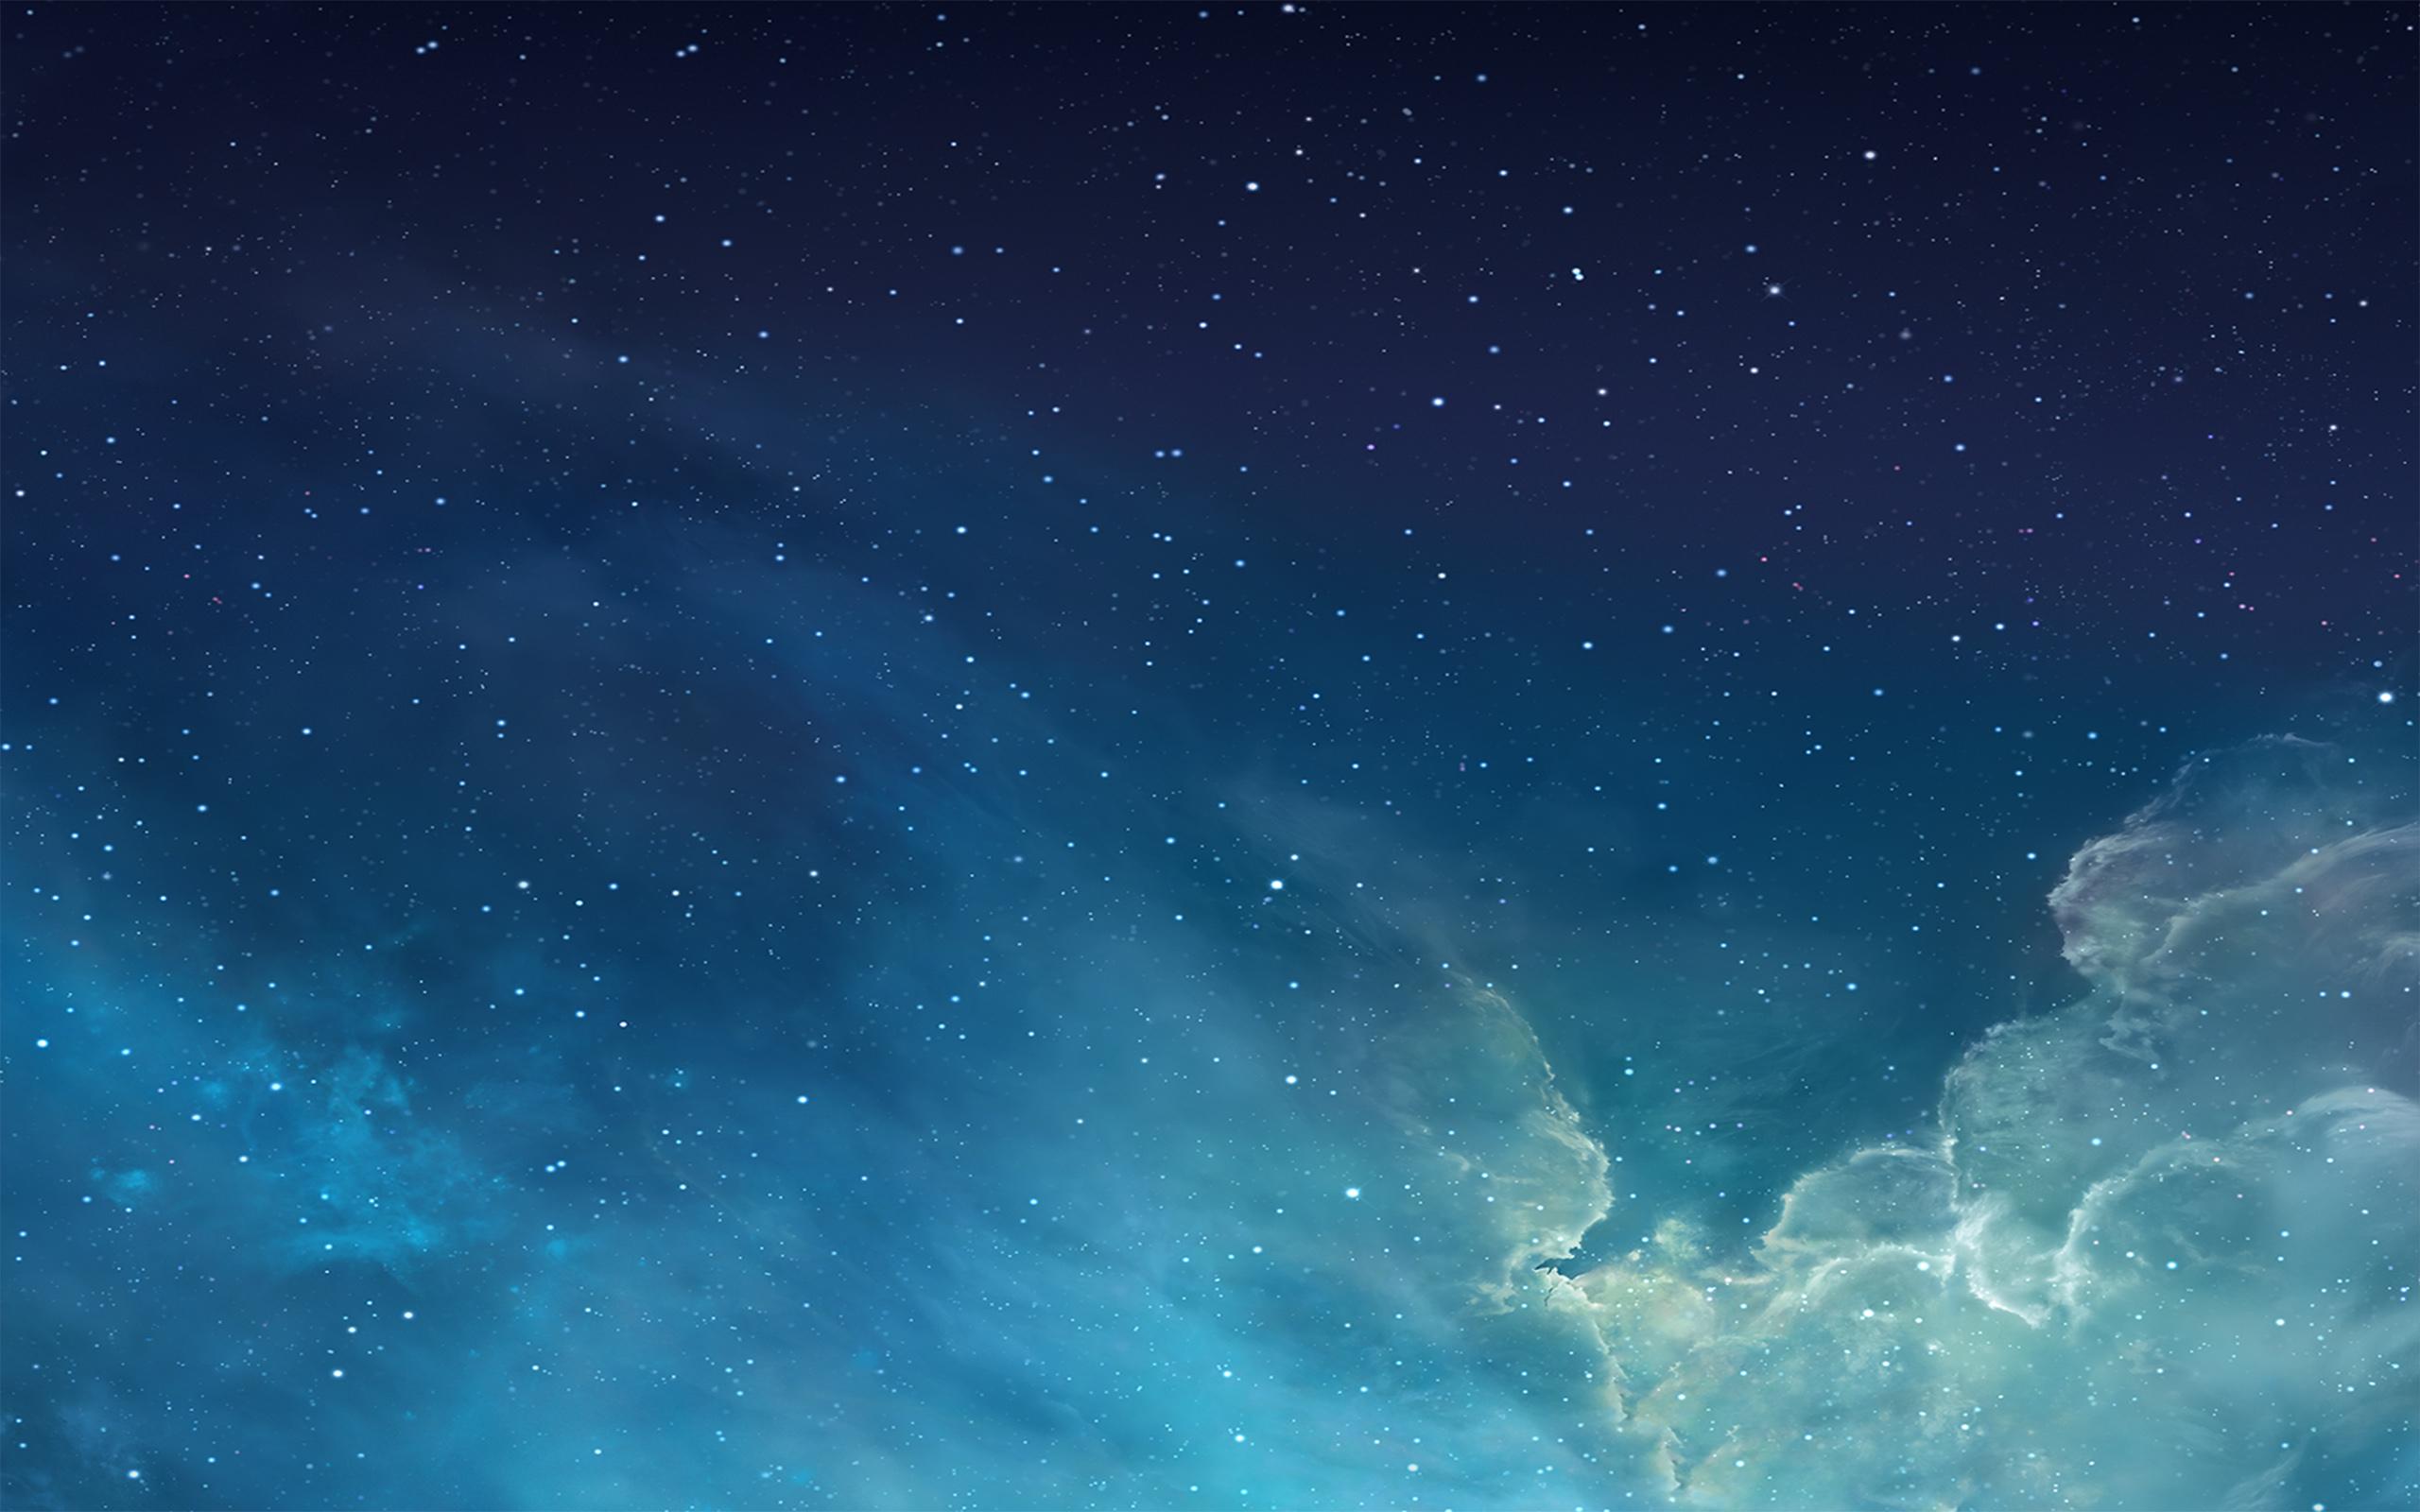 Night Sky Wallpaper Tablet Hd Desktop Wallpapers 4k Hd